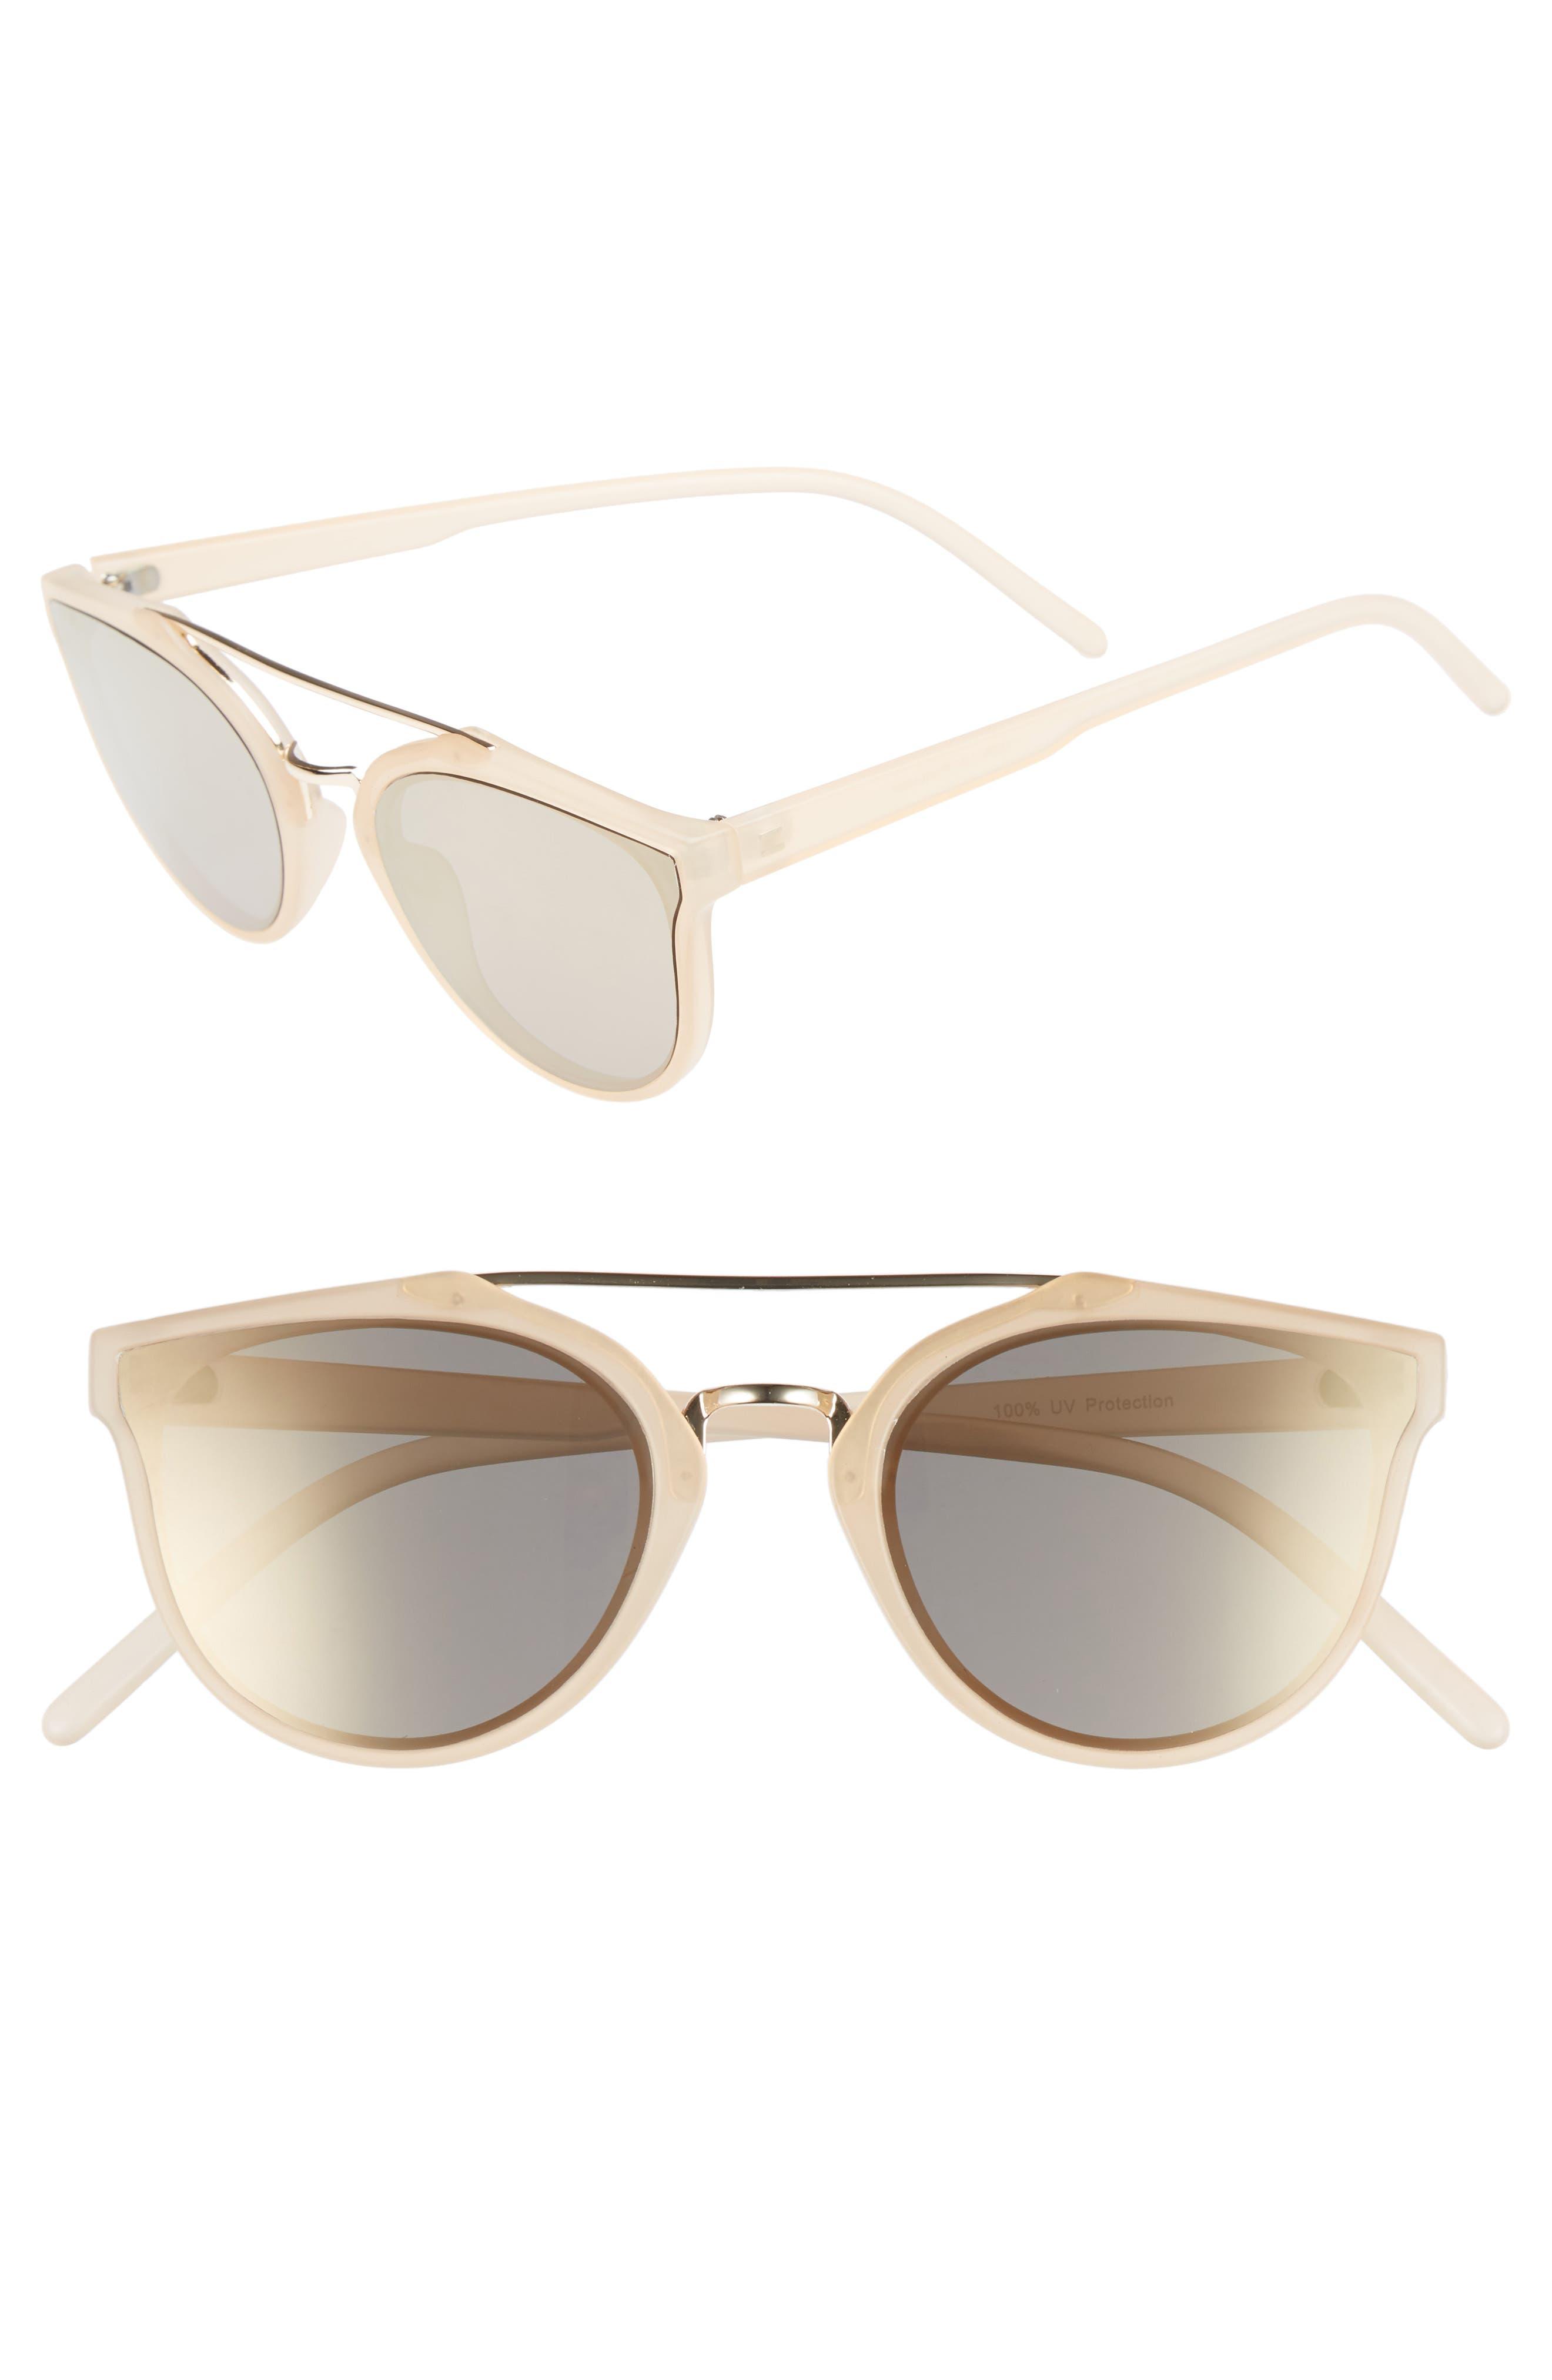 Aviator Sunglasses,                         Main,                         color, 950